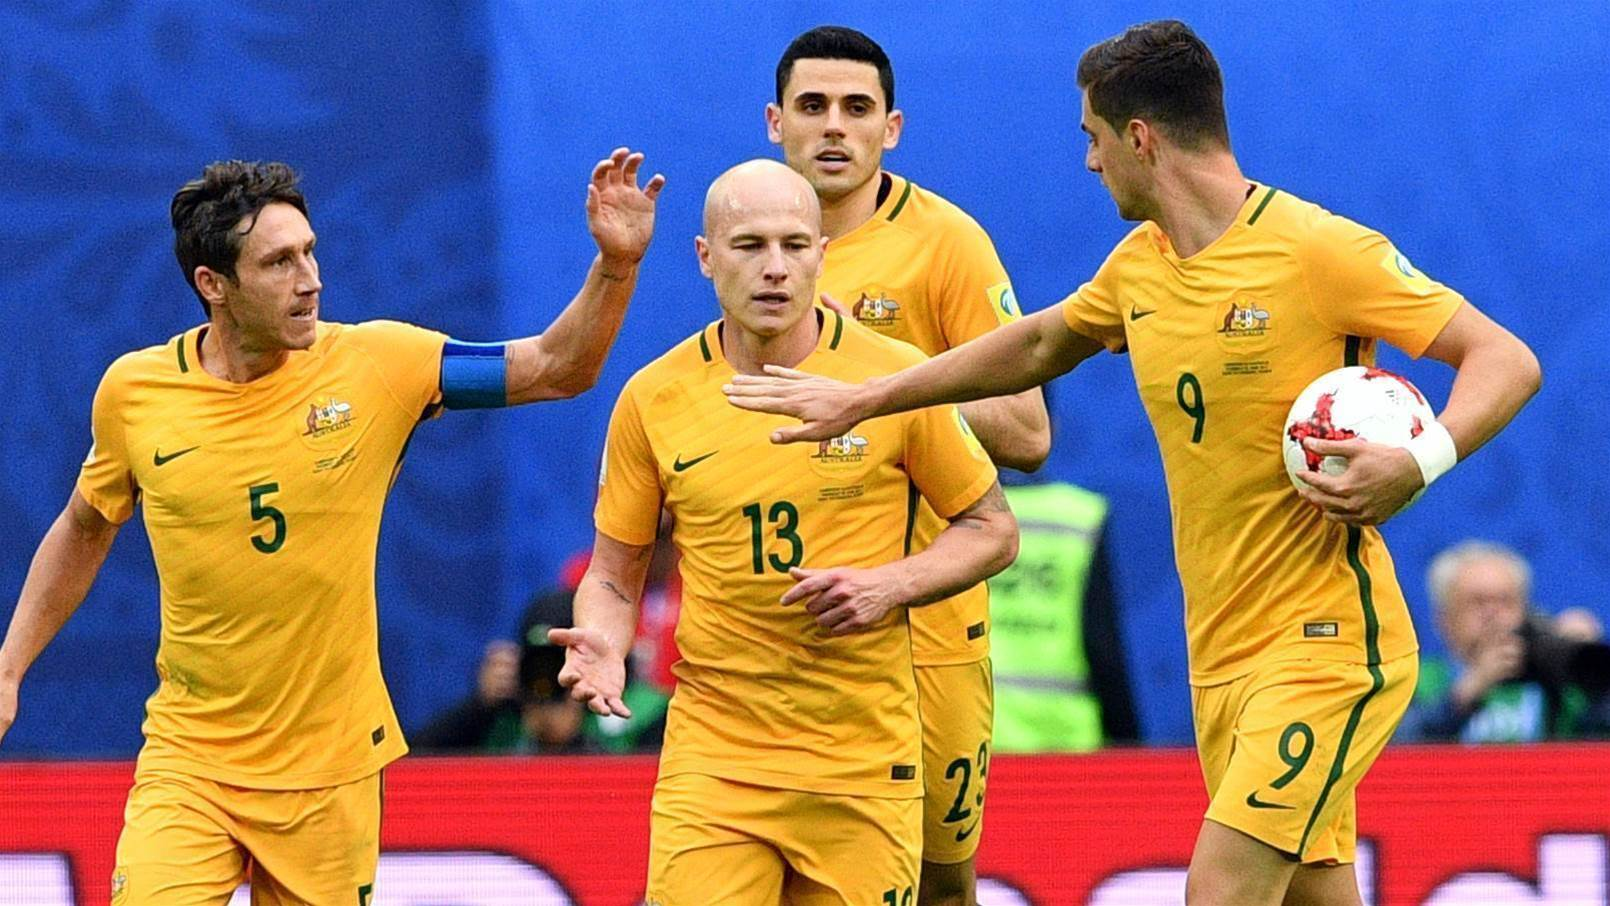 Postecoglou names 30-man Socceroos squad